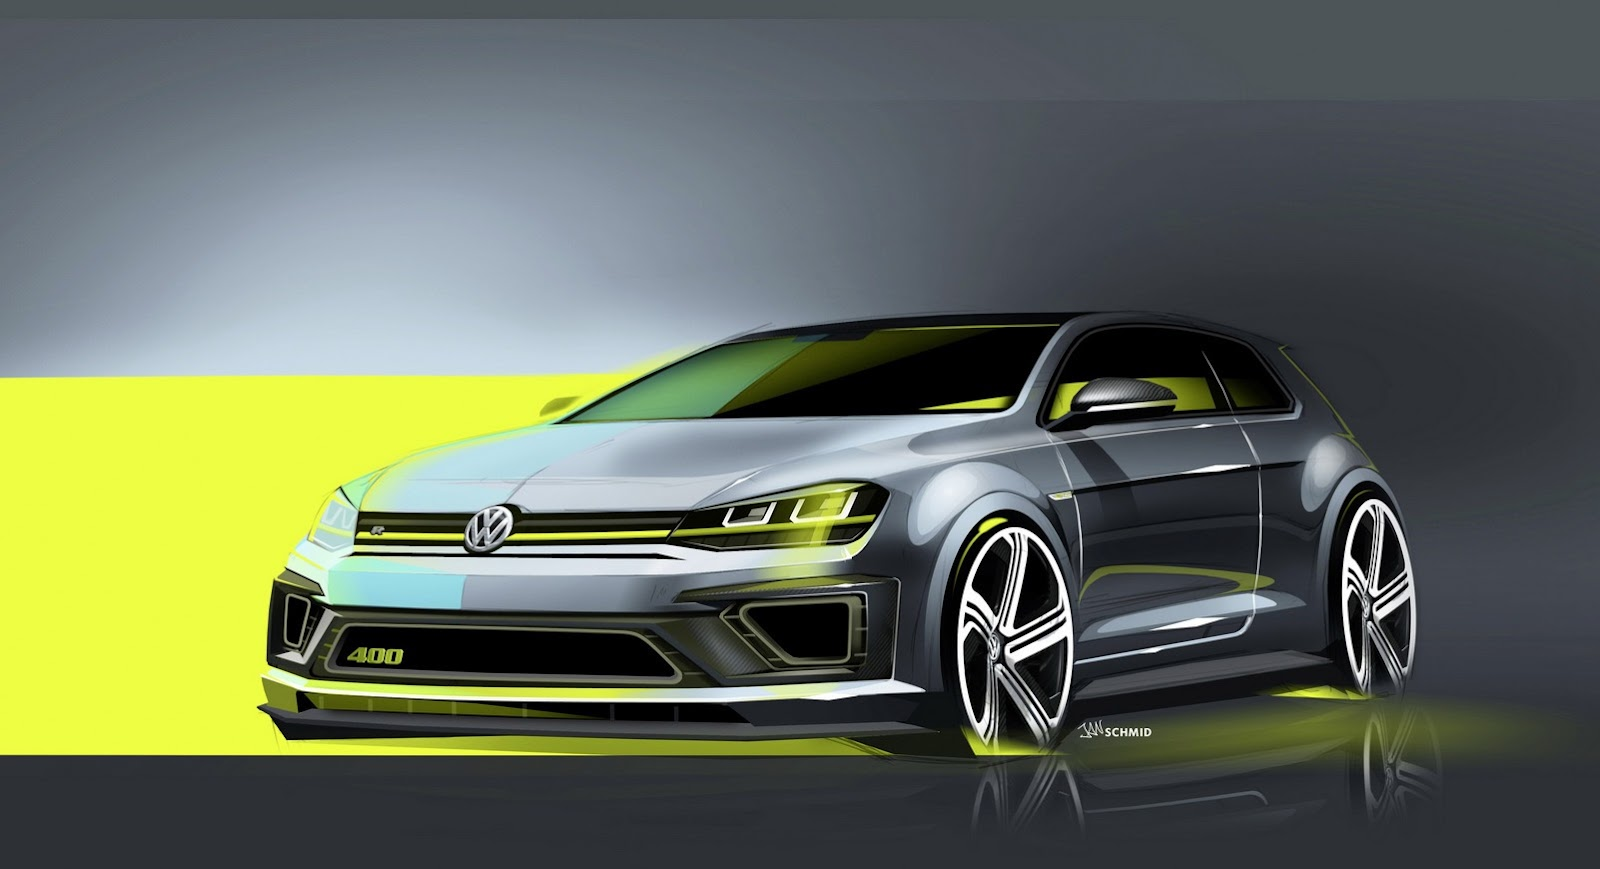 volkswagen golf vii r400 concept beijing 2014 forocoches. Black Bedroom Furniture Sets. Home Design Ideas